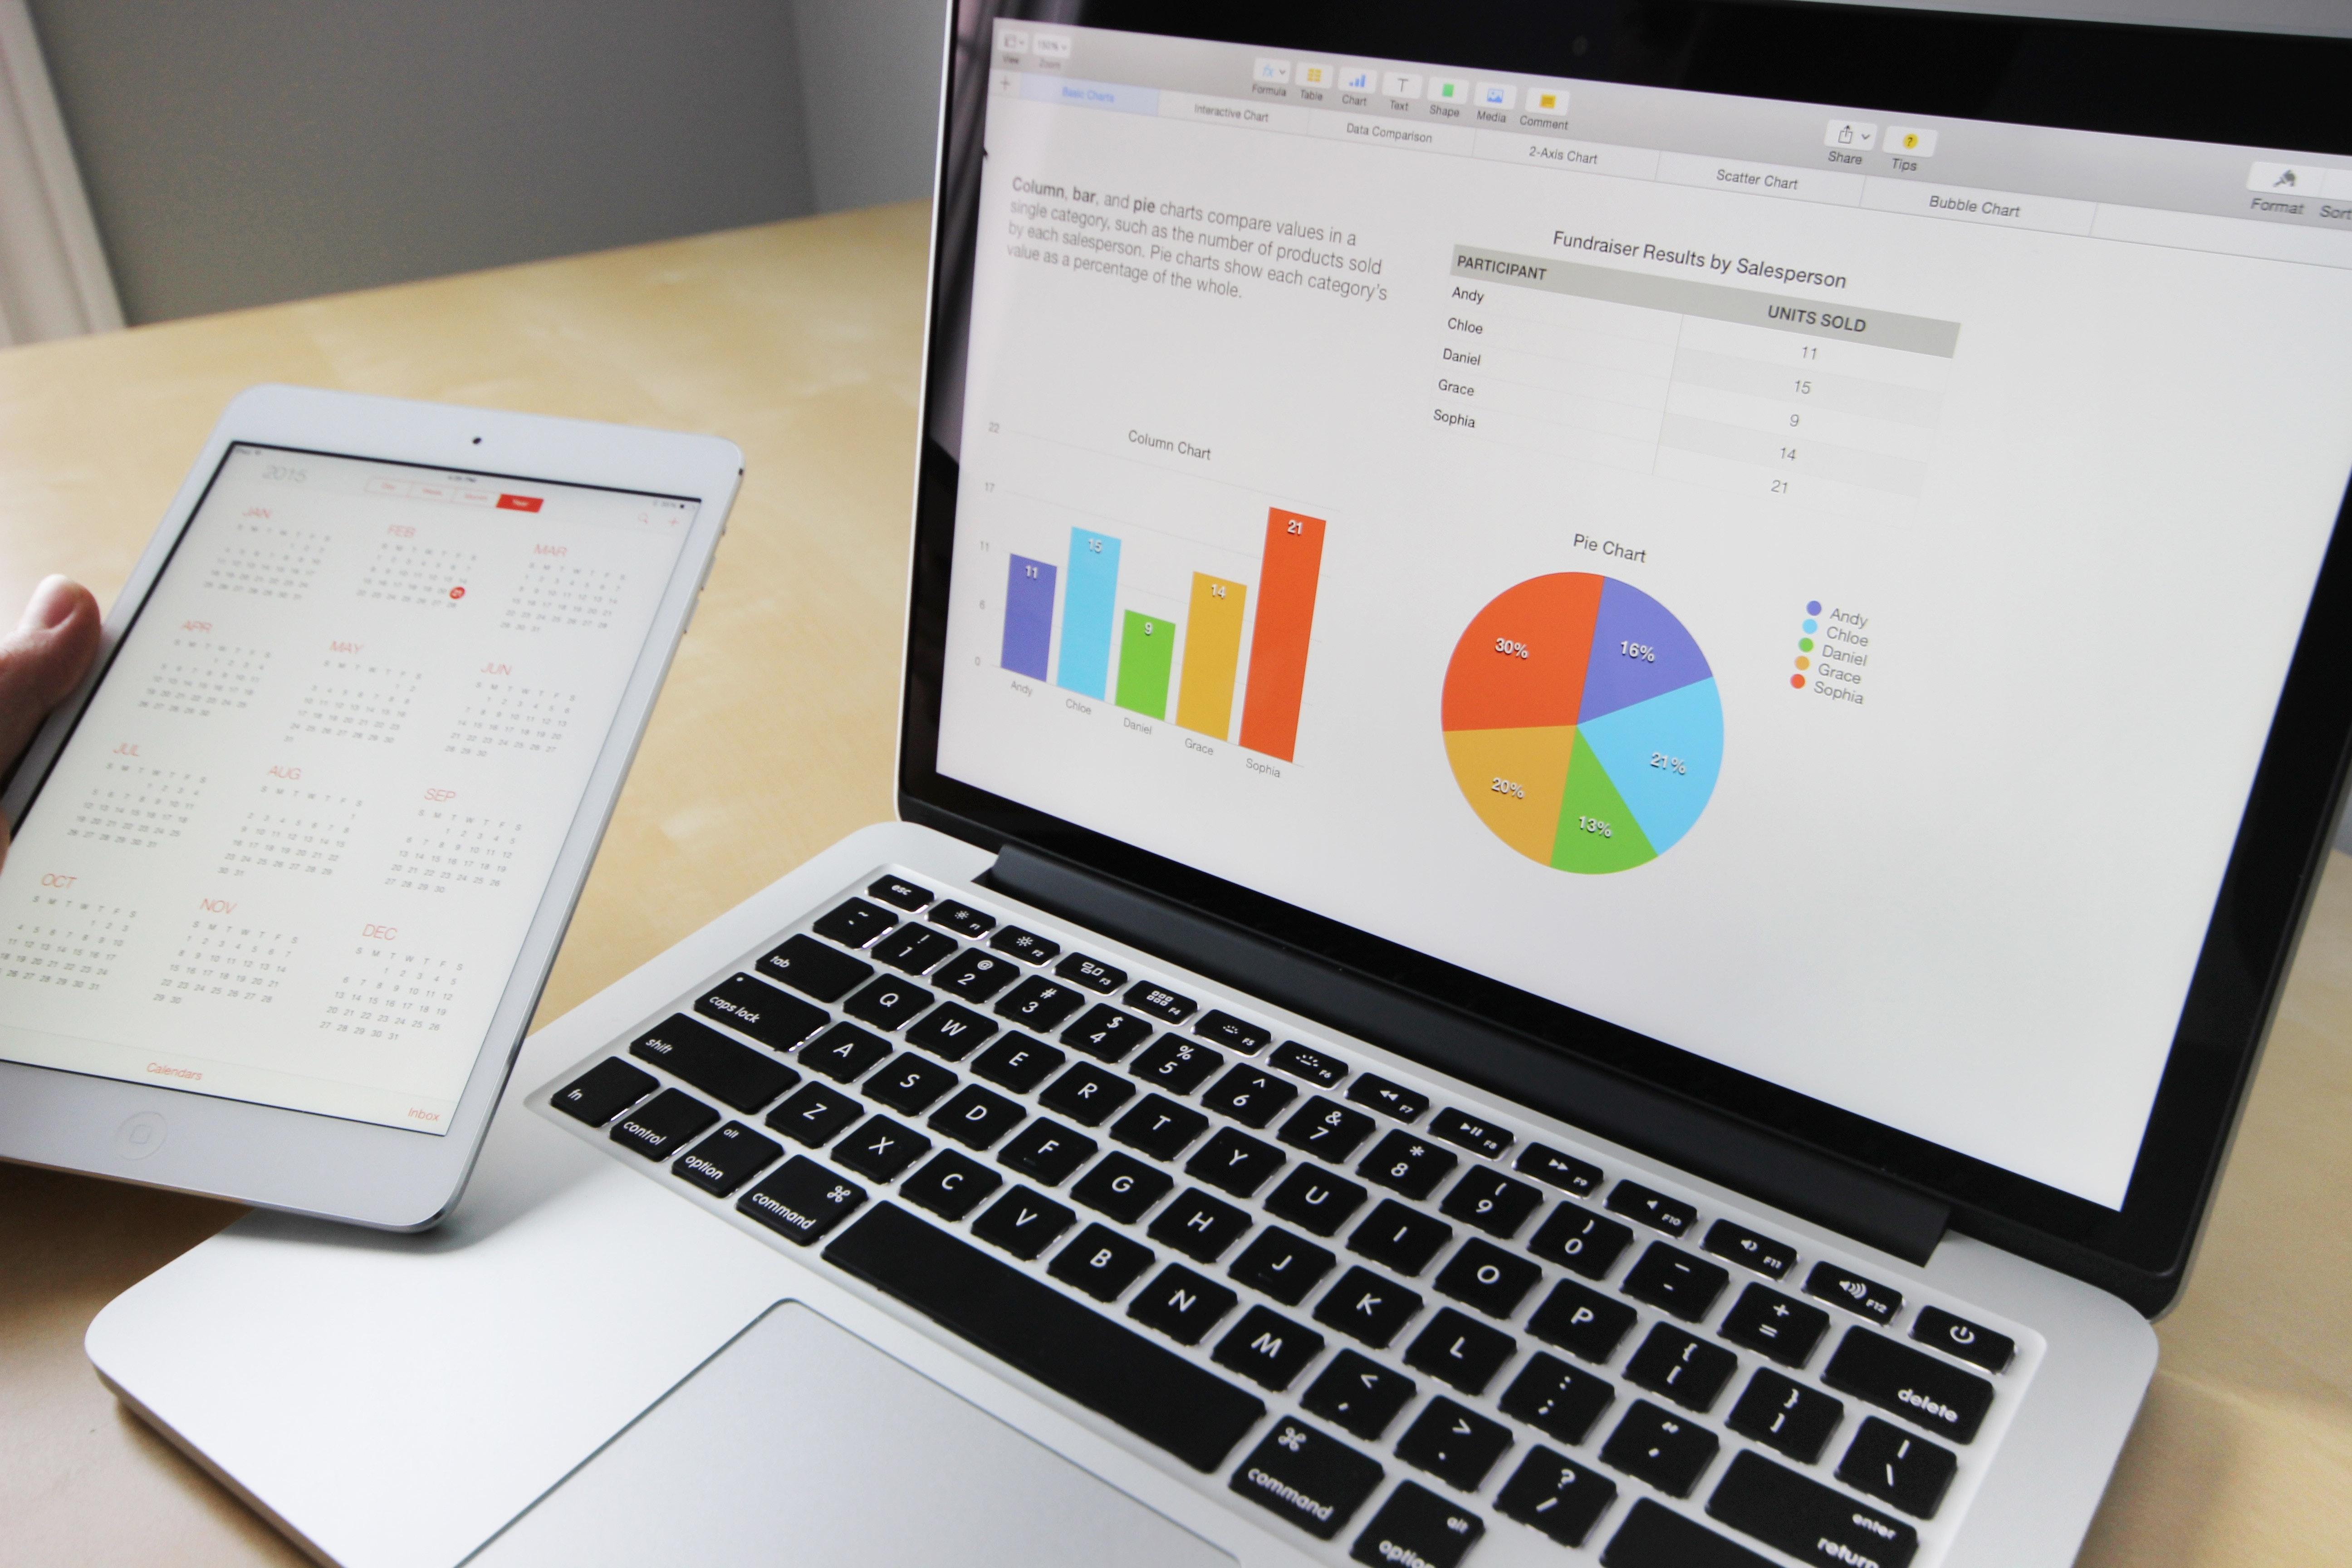 Marketing metrics displayed on laptop and tablet